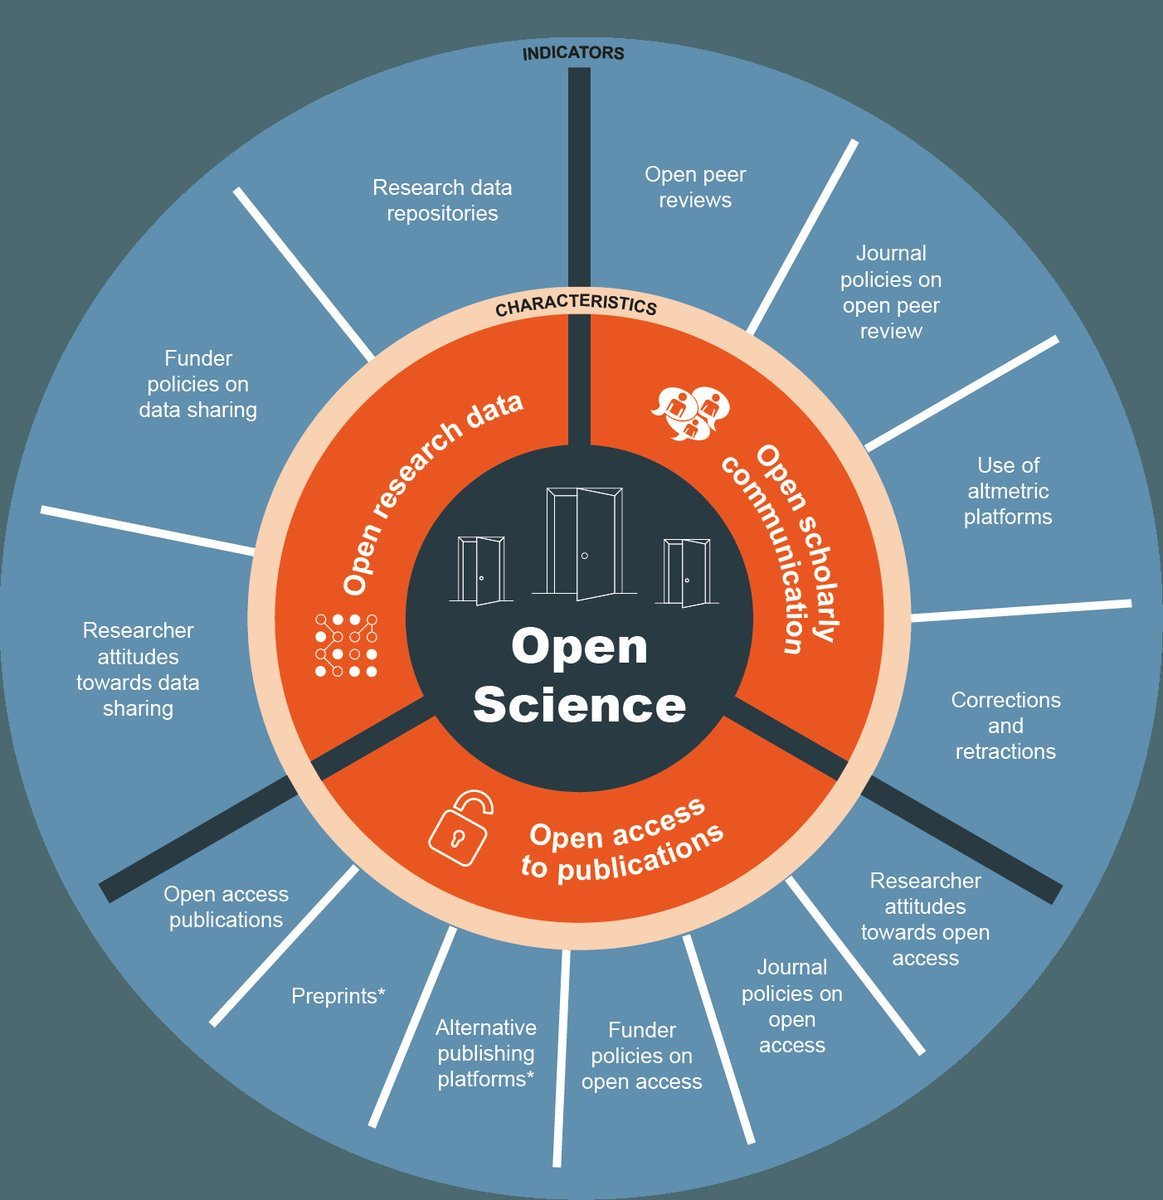 What is #OpenScience ?  #DataScience #BigData #InfoGraphic #AI #IoT #Defstar5  #Mpgvip #MakeYourOwnLane  #MachineLearning #DataScience #IIoT #technology #Blockchain #DataScientist #data<br>http://pic.twitter.com/9bxu44jMr2